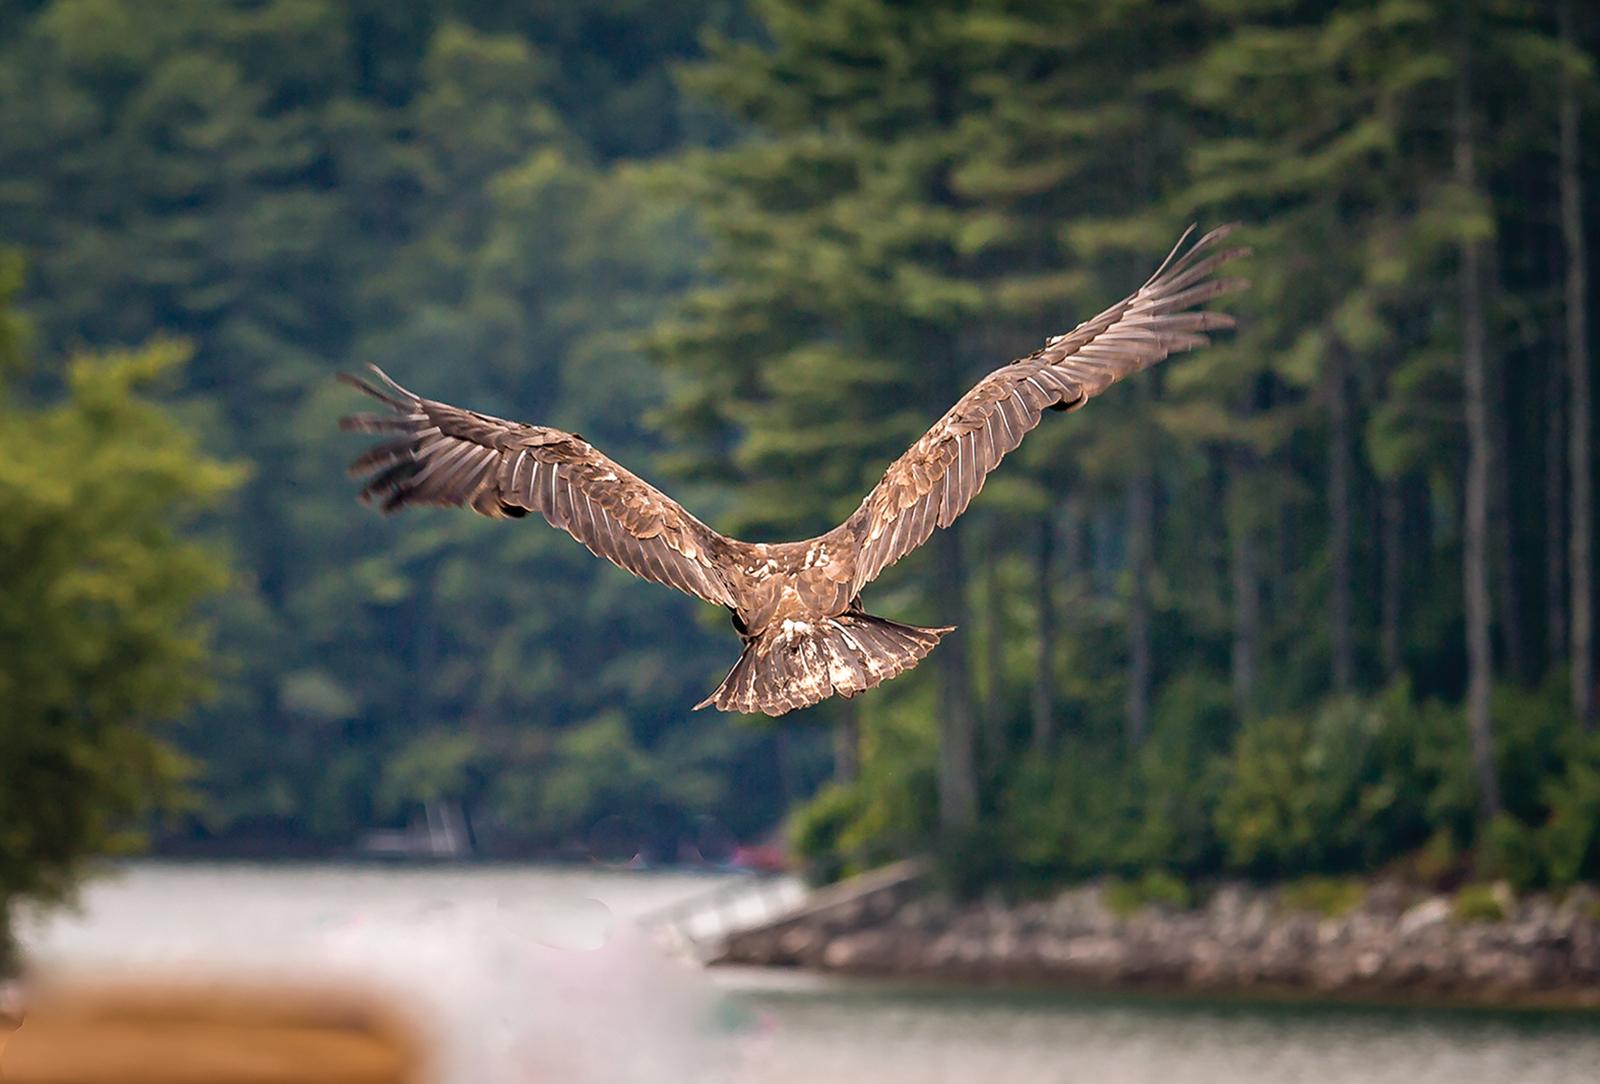 highlands nc cashiers nc village nature series eagle